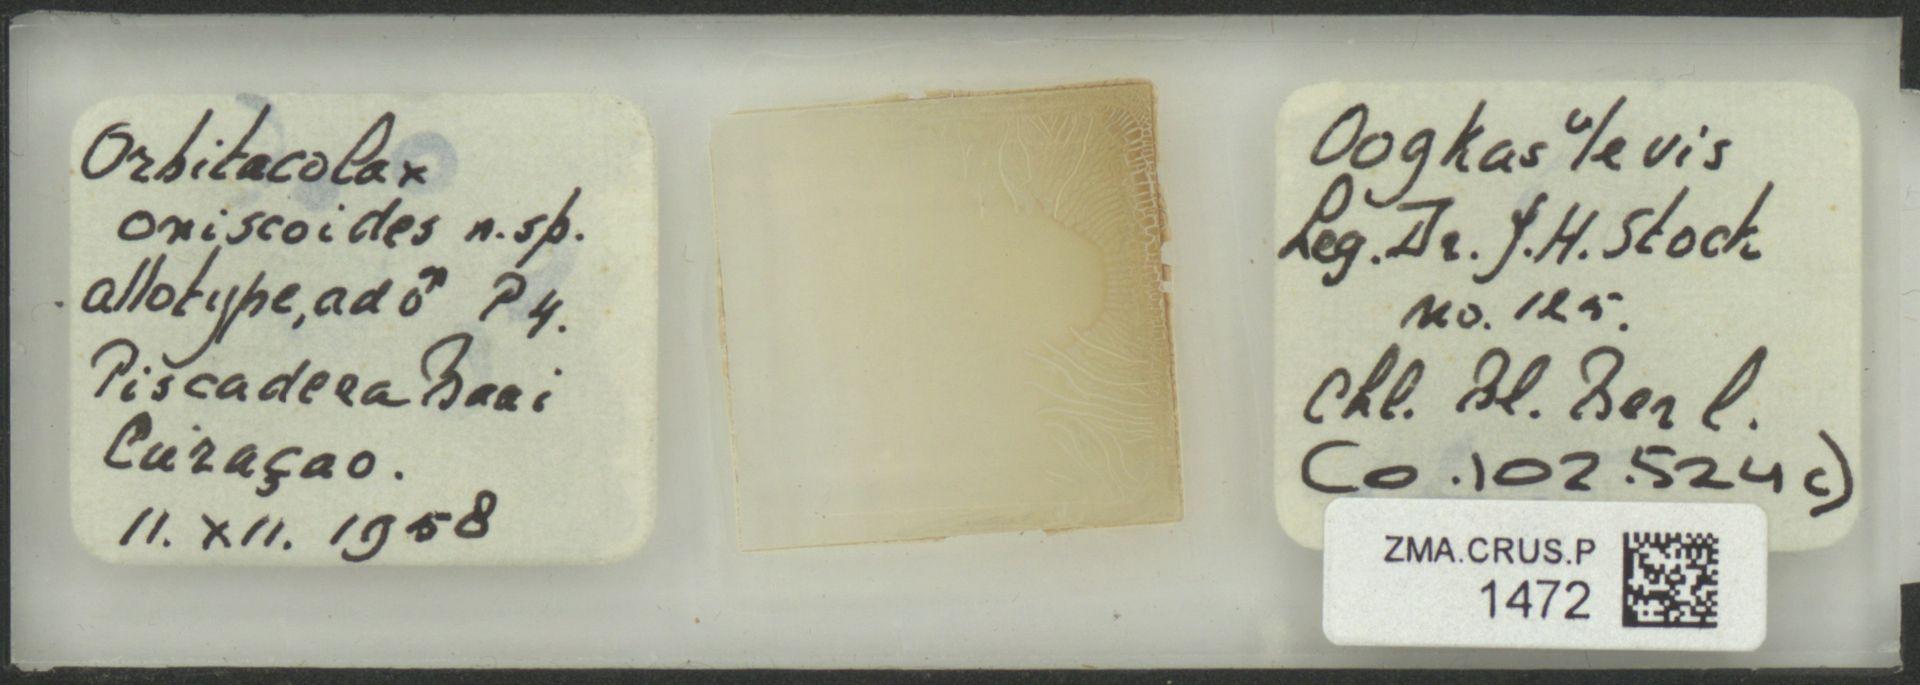 ZMA.CRUS.P.1472 | Orbitocolax oniscoides